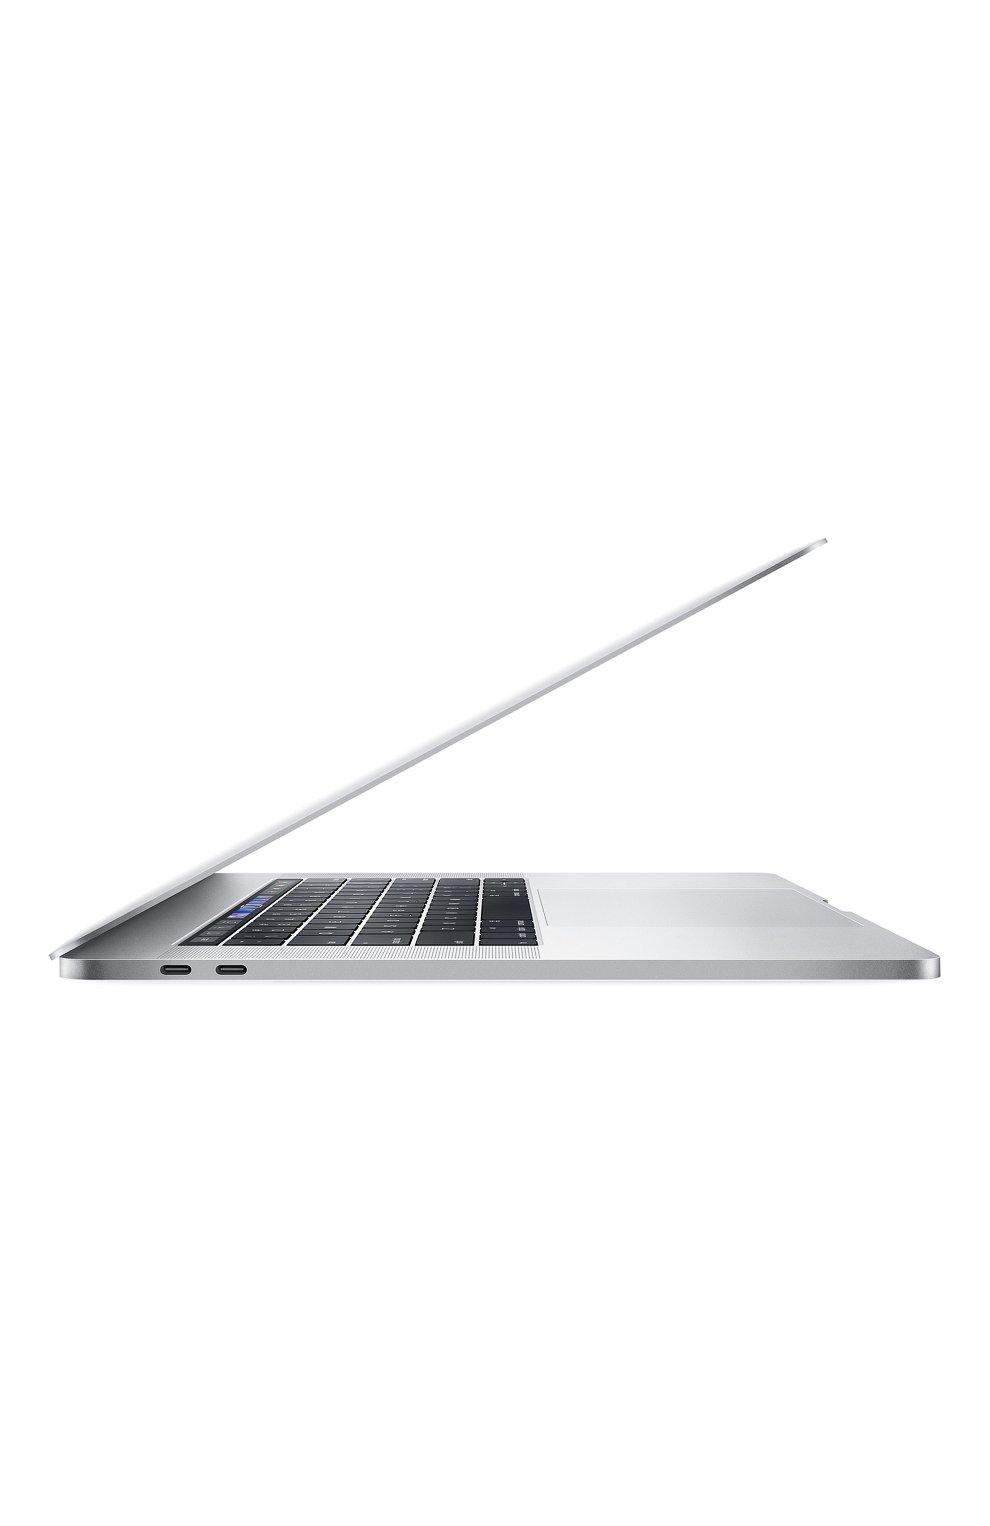 "MacBook Pro 15"" с панелью Touch Bar со встроенным датчиком Touch ID 6-Core i7 2.2GHz 256GB Silver Apple  | Фото №2"